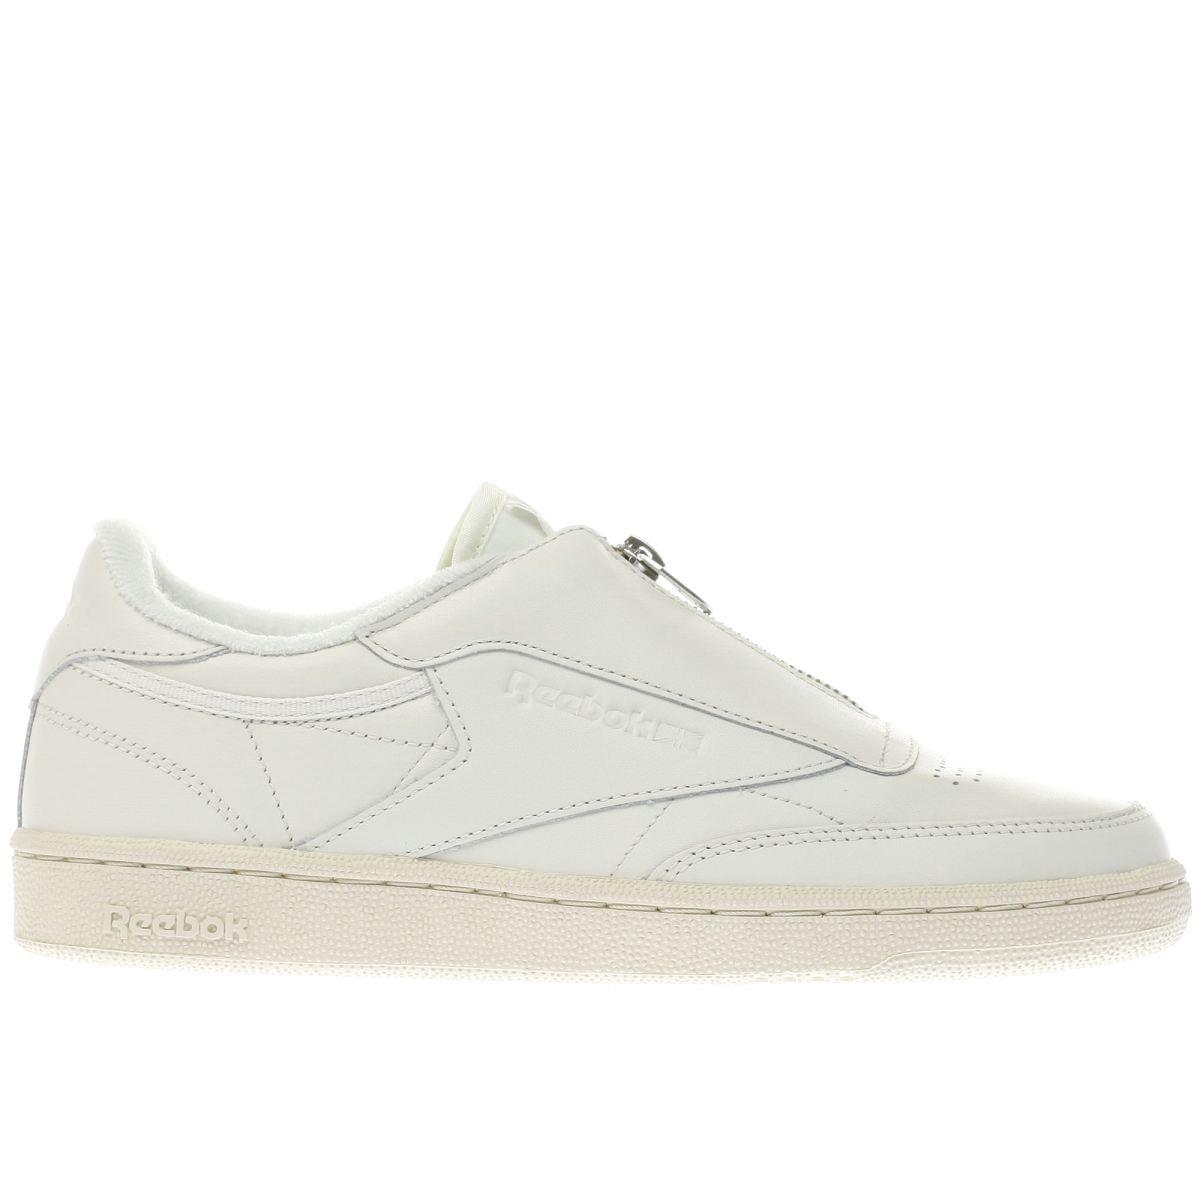 reebok white club c 85 zip trainers